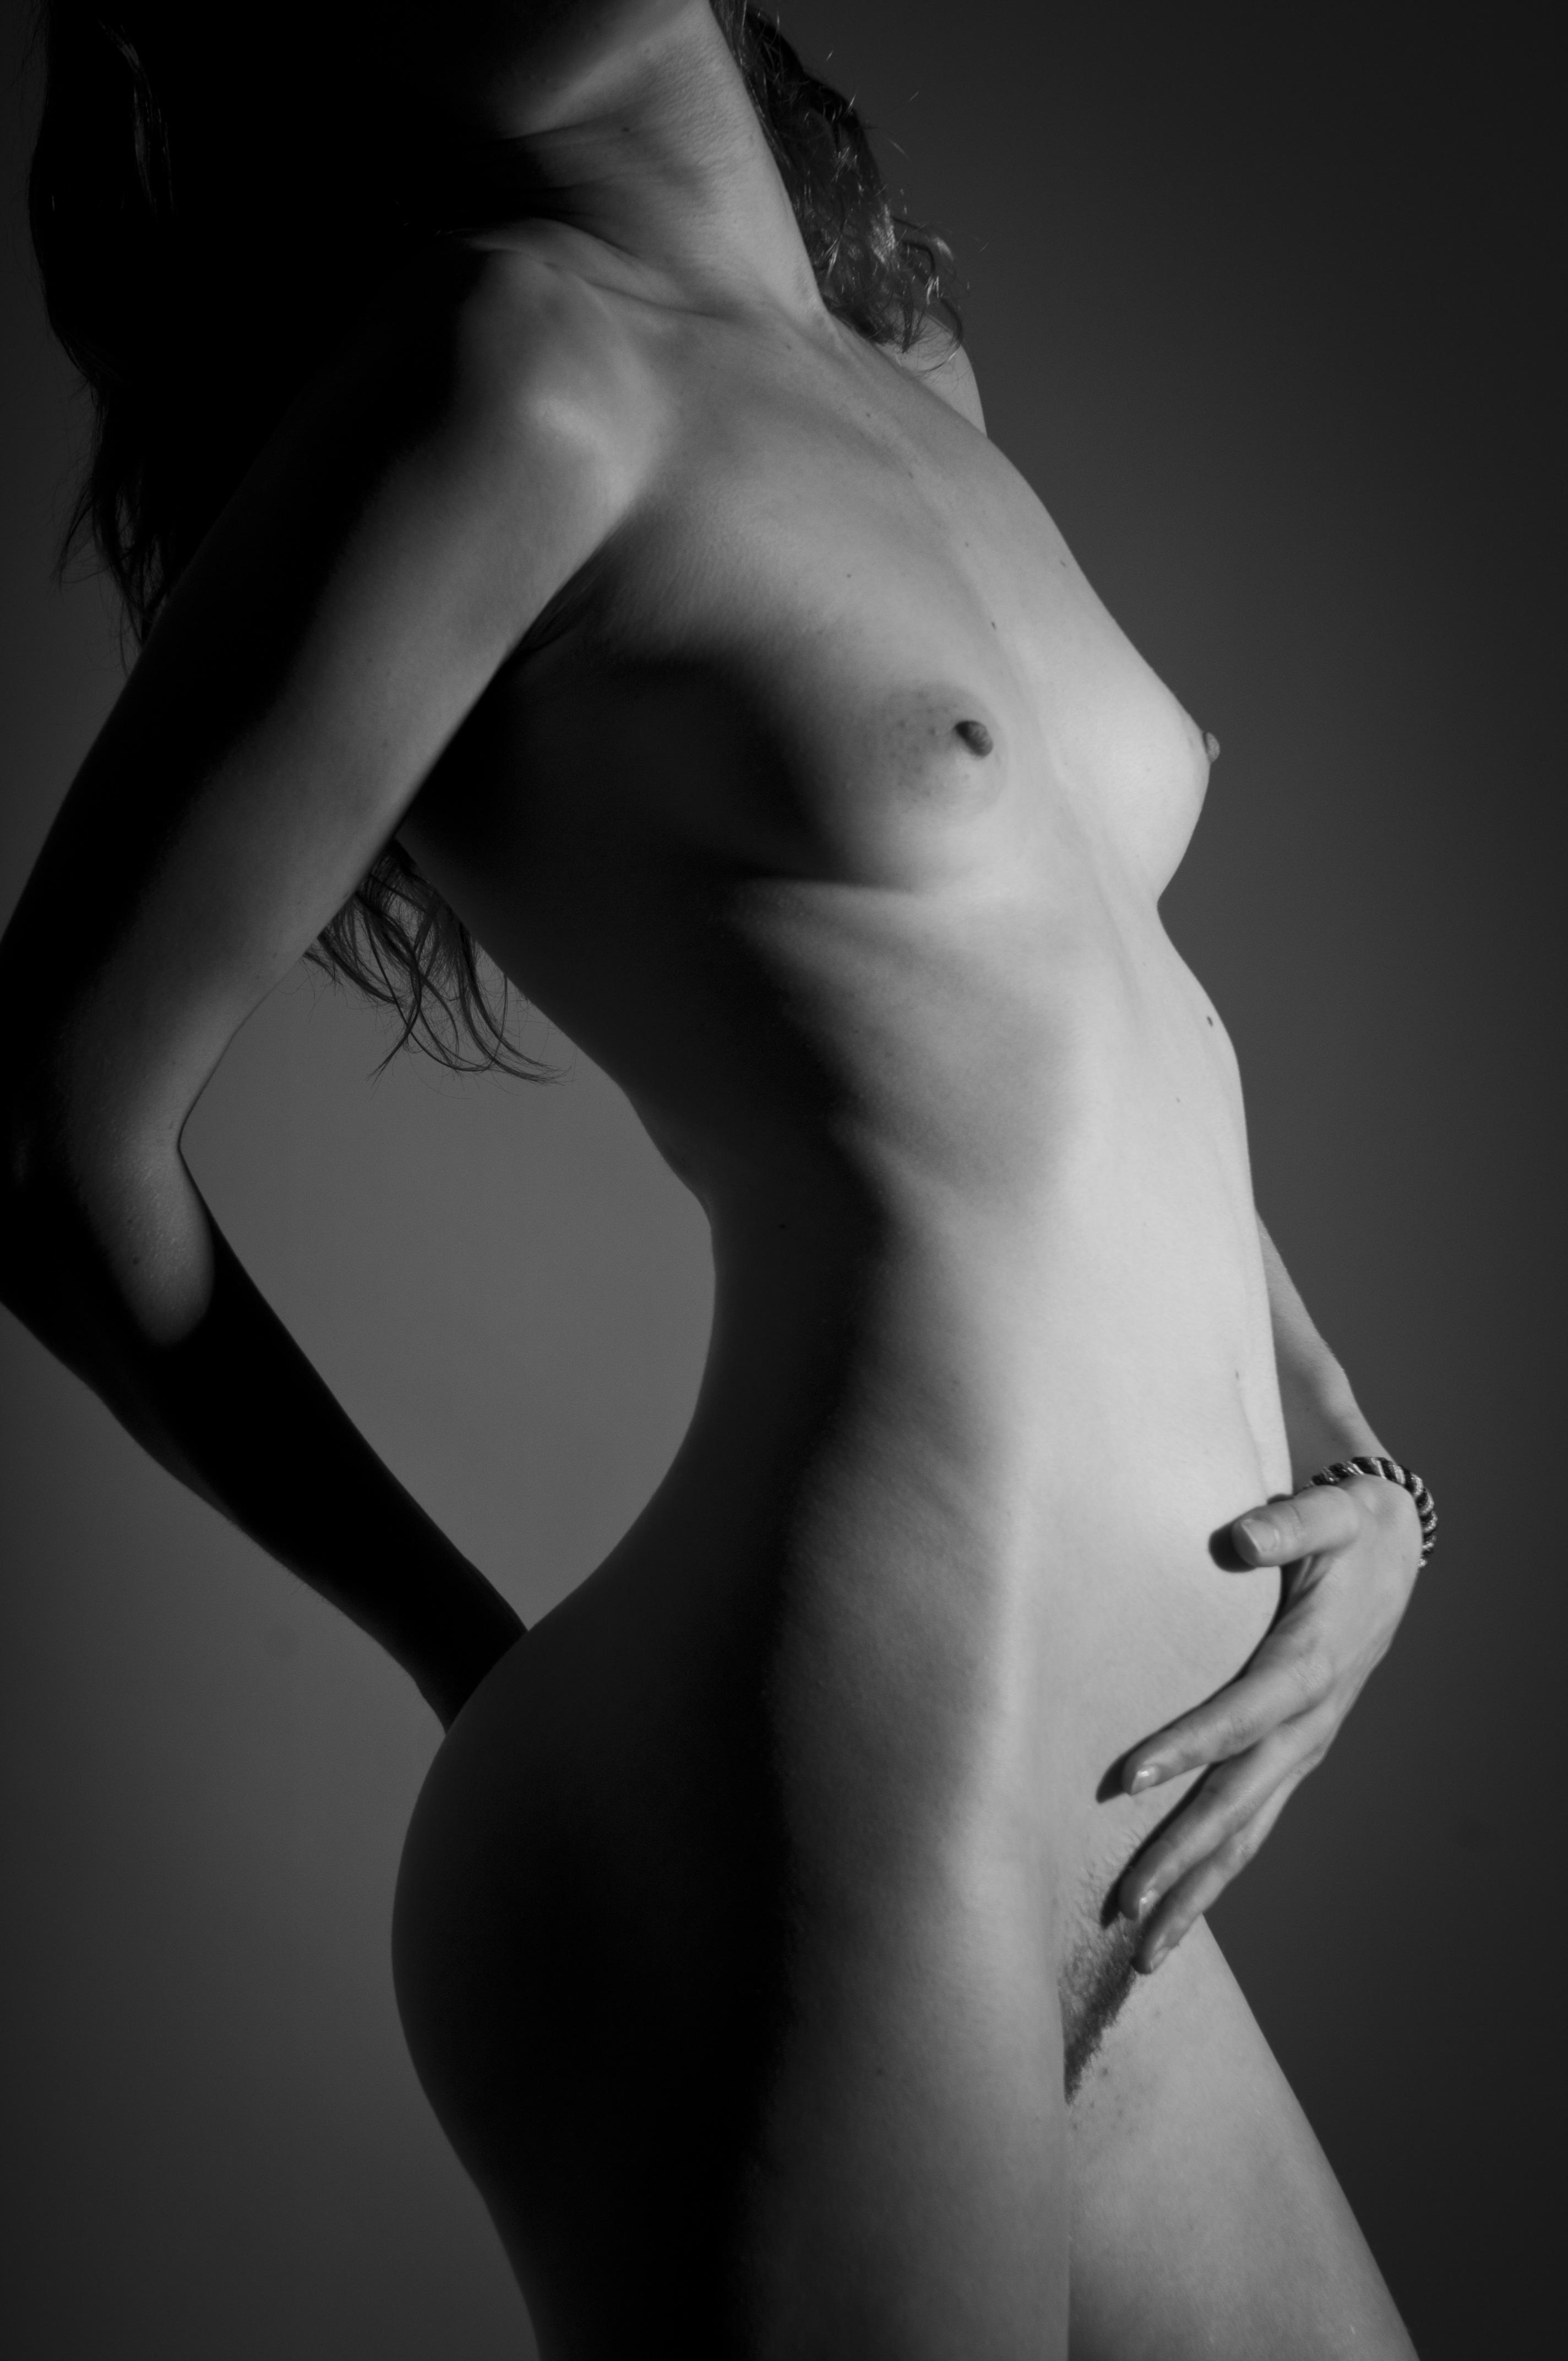 söpö alaston kuva BBW porno luettelo